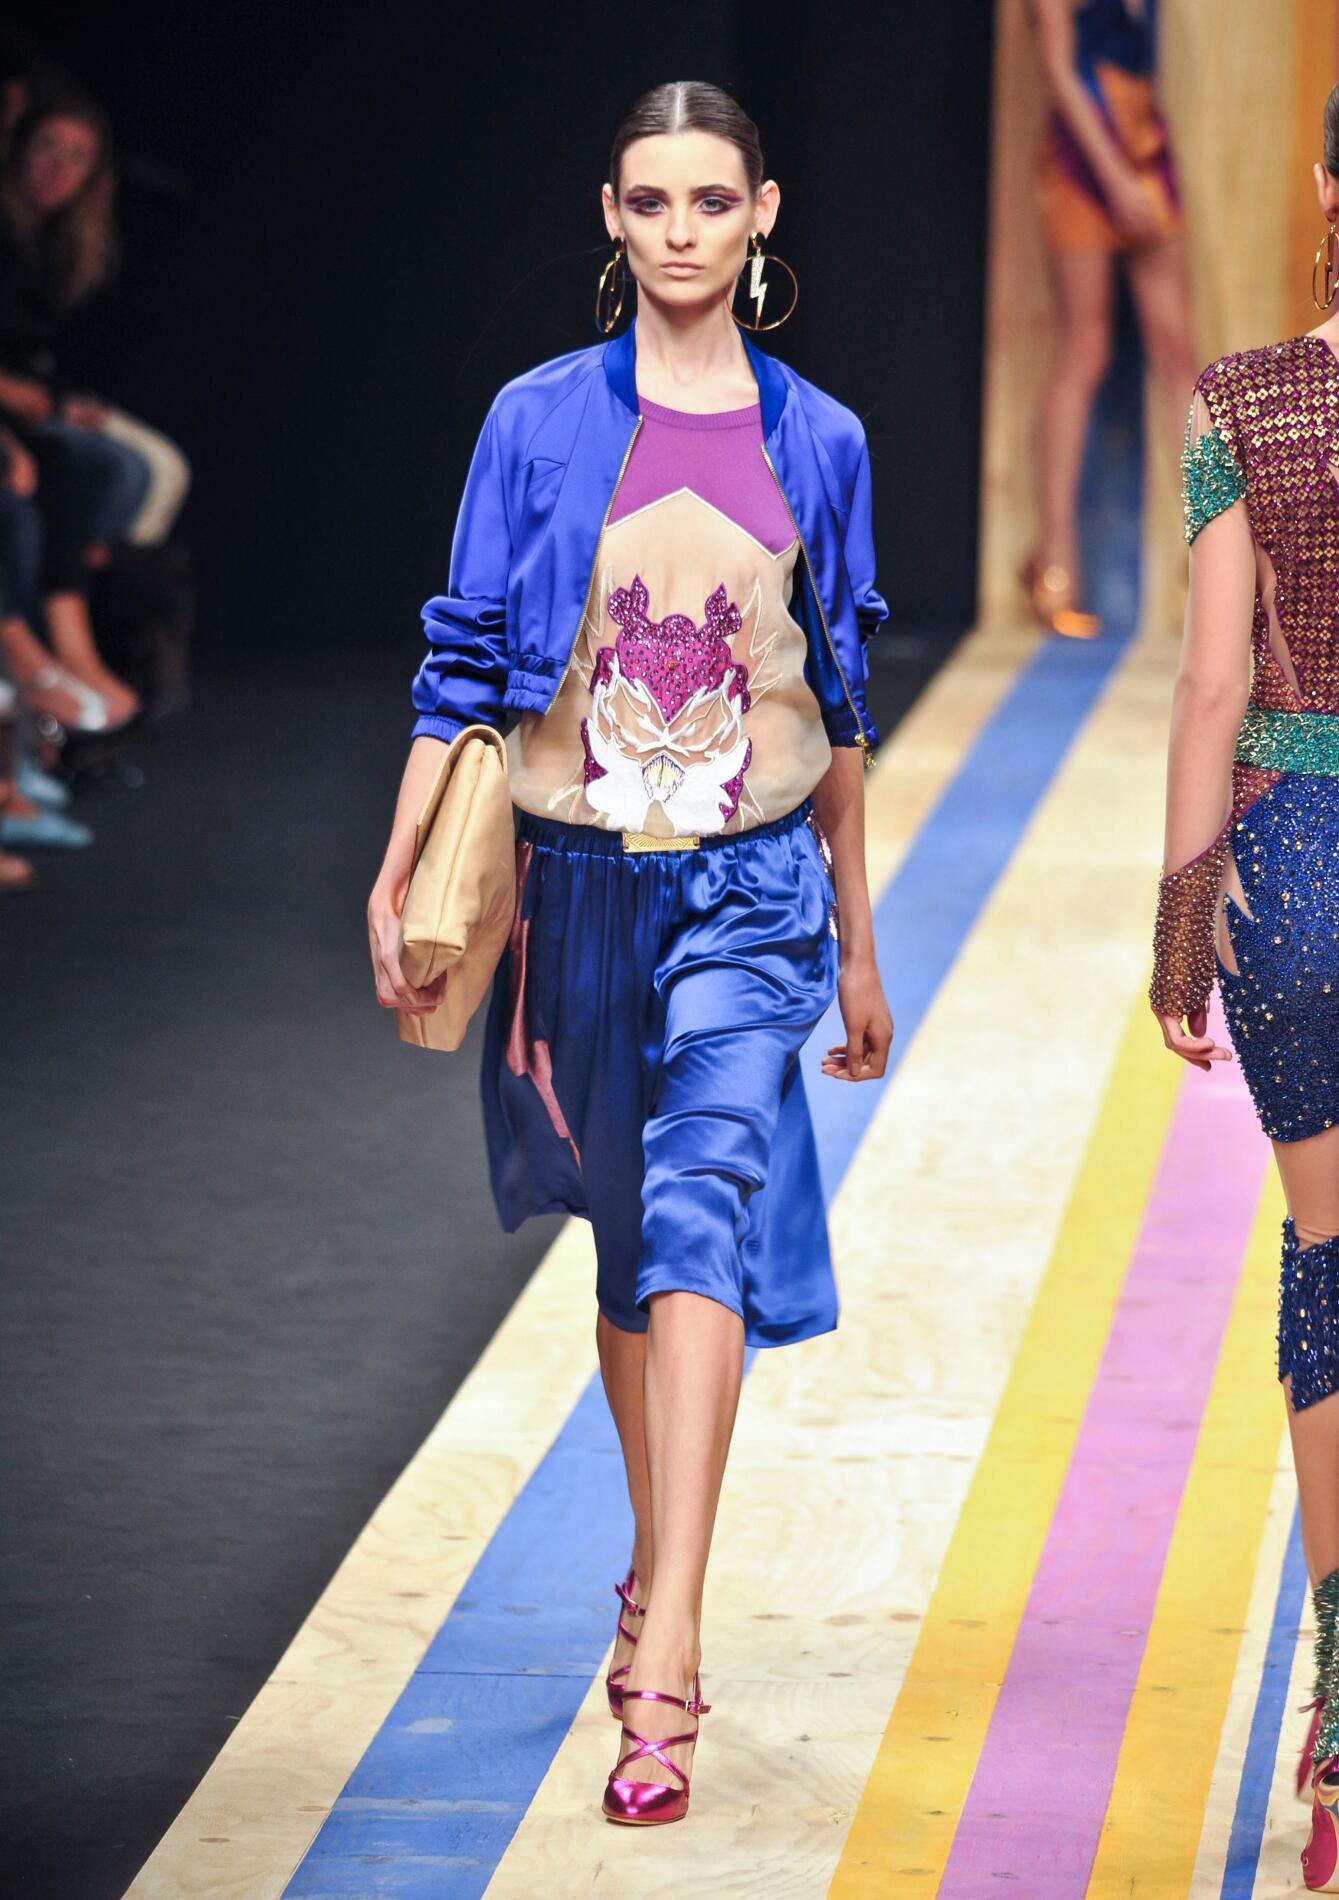 Spring Summer 2013 Fashion Women's Collection Frankie Morello